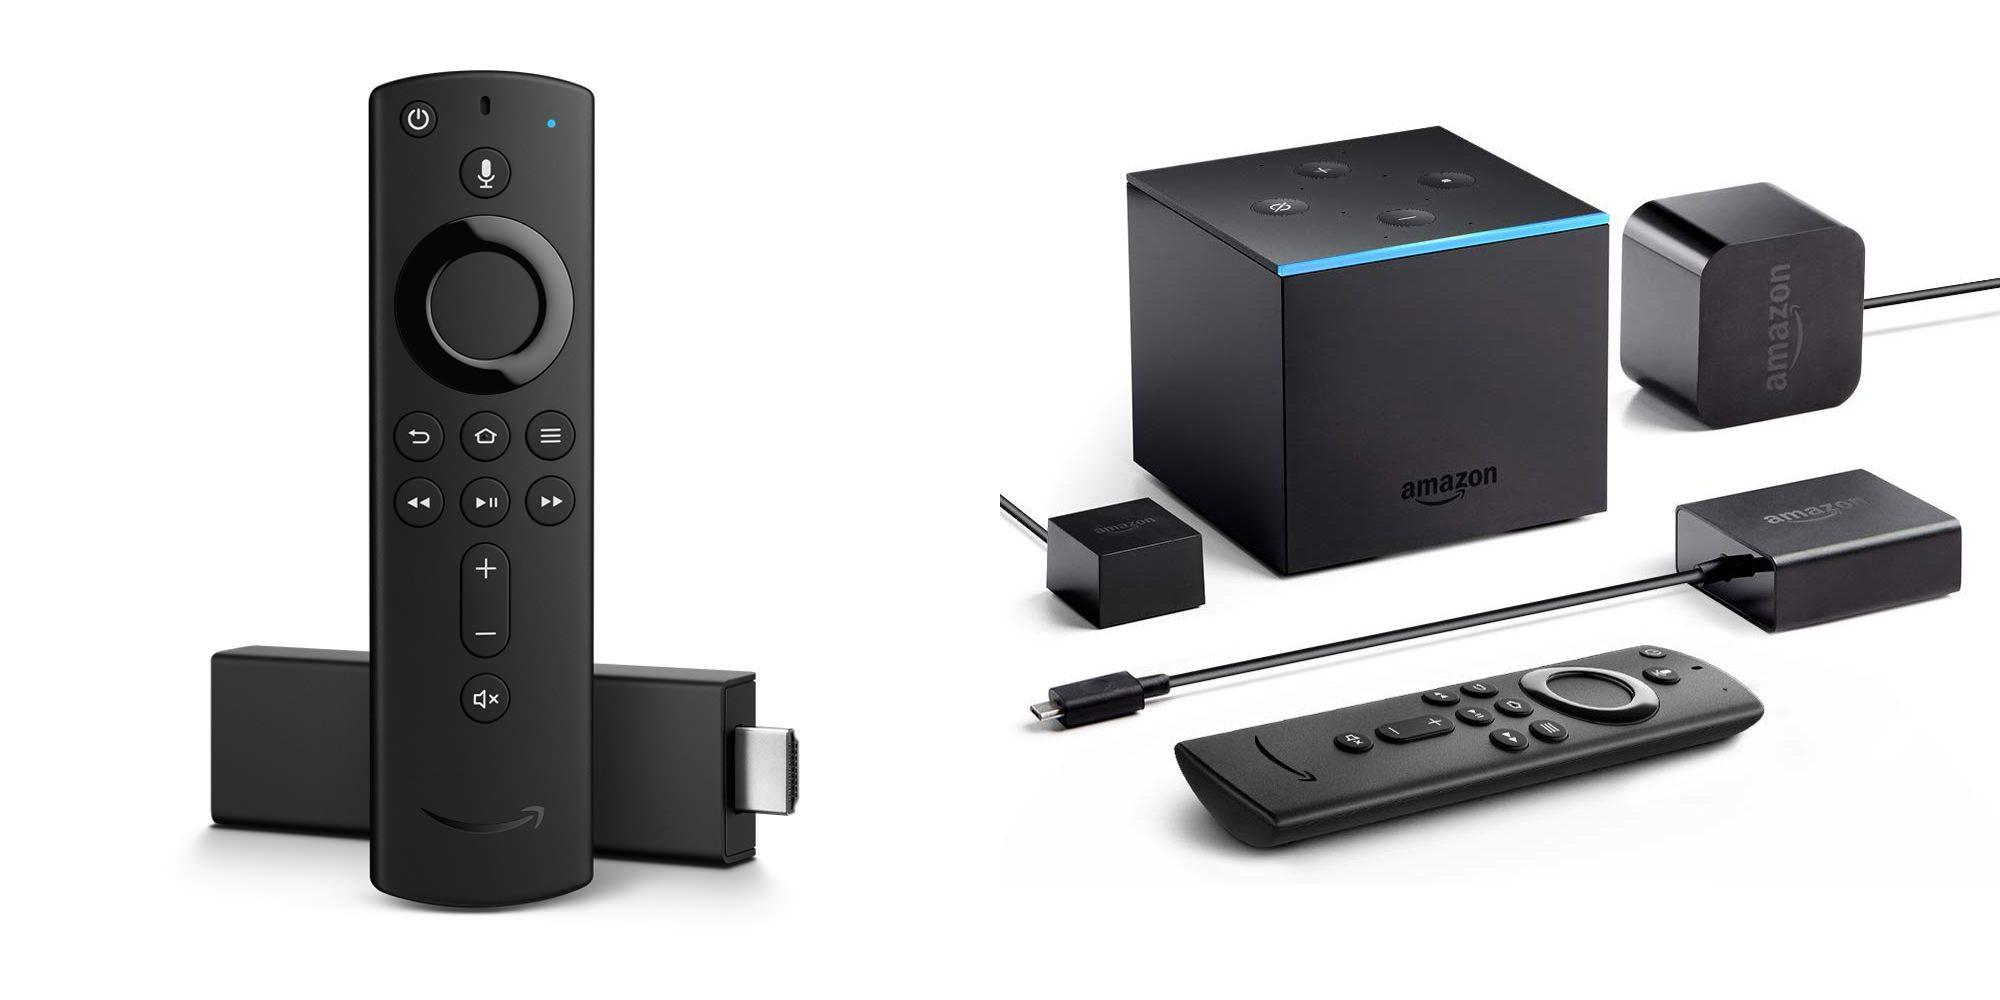 9to5Toys Letzter Anruf: Pixel 3 / XL Fälle $ 4, Anker Bluetooth Soundbar $ 68, Vivitek Wireless 720p Projektor $ 320, mehr